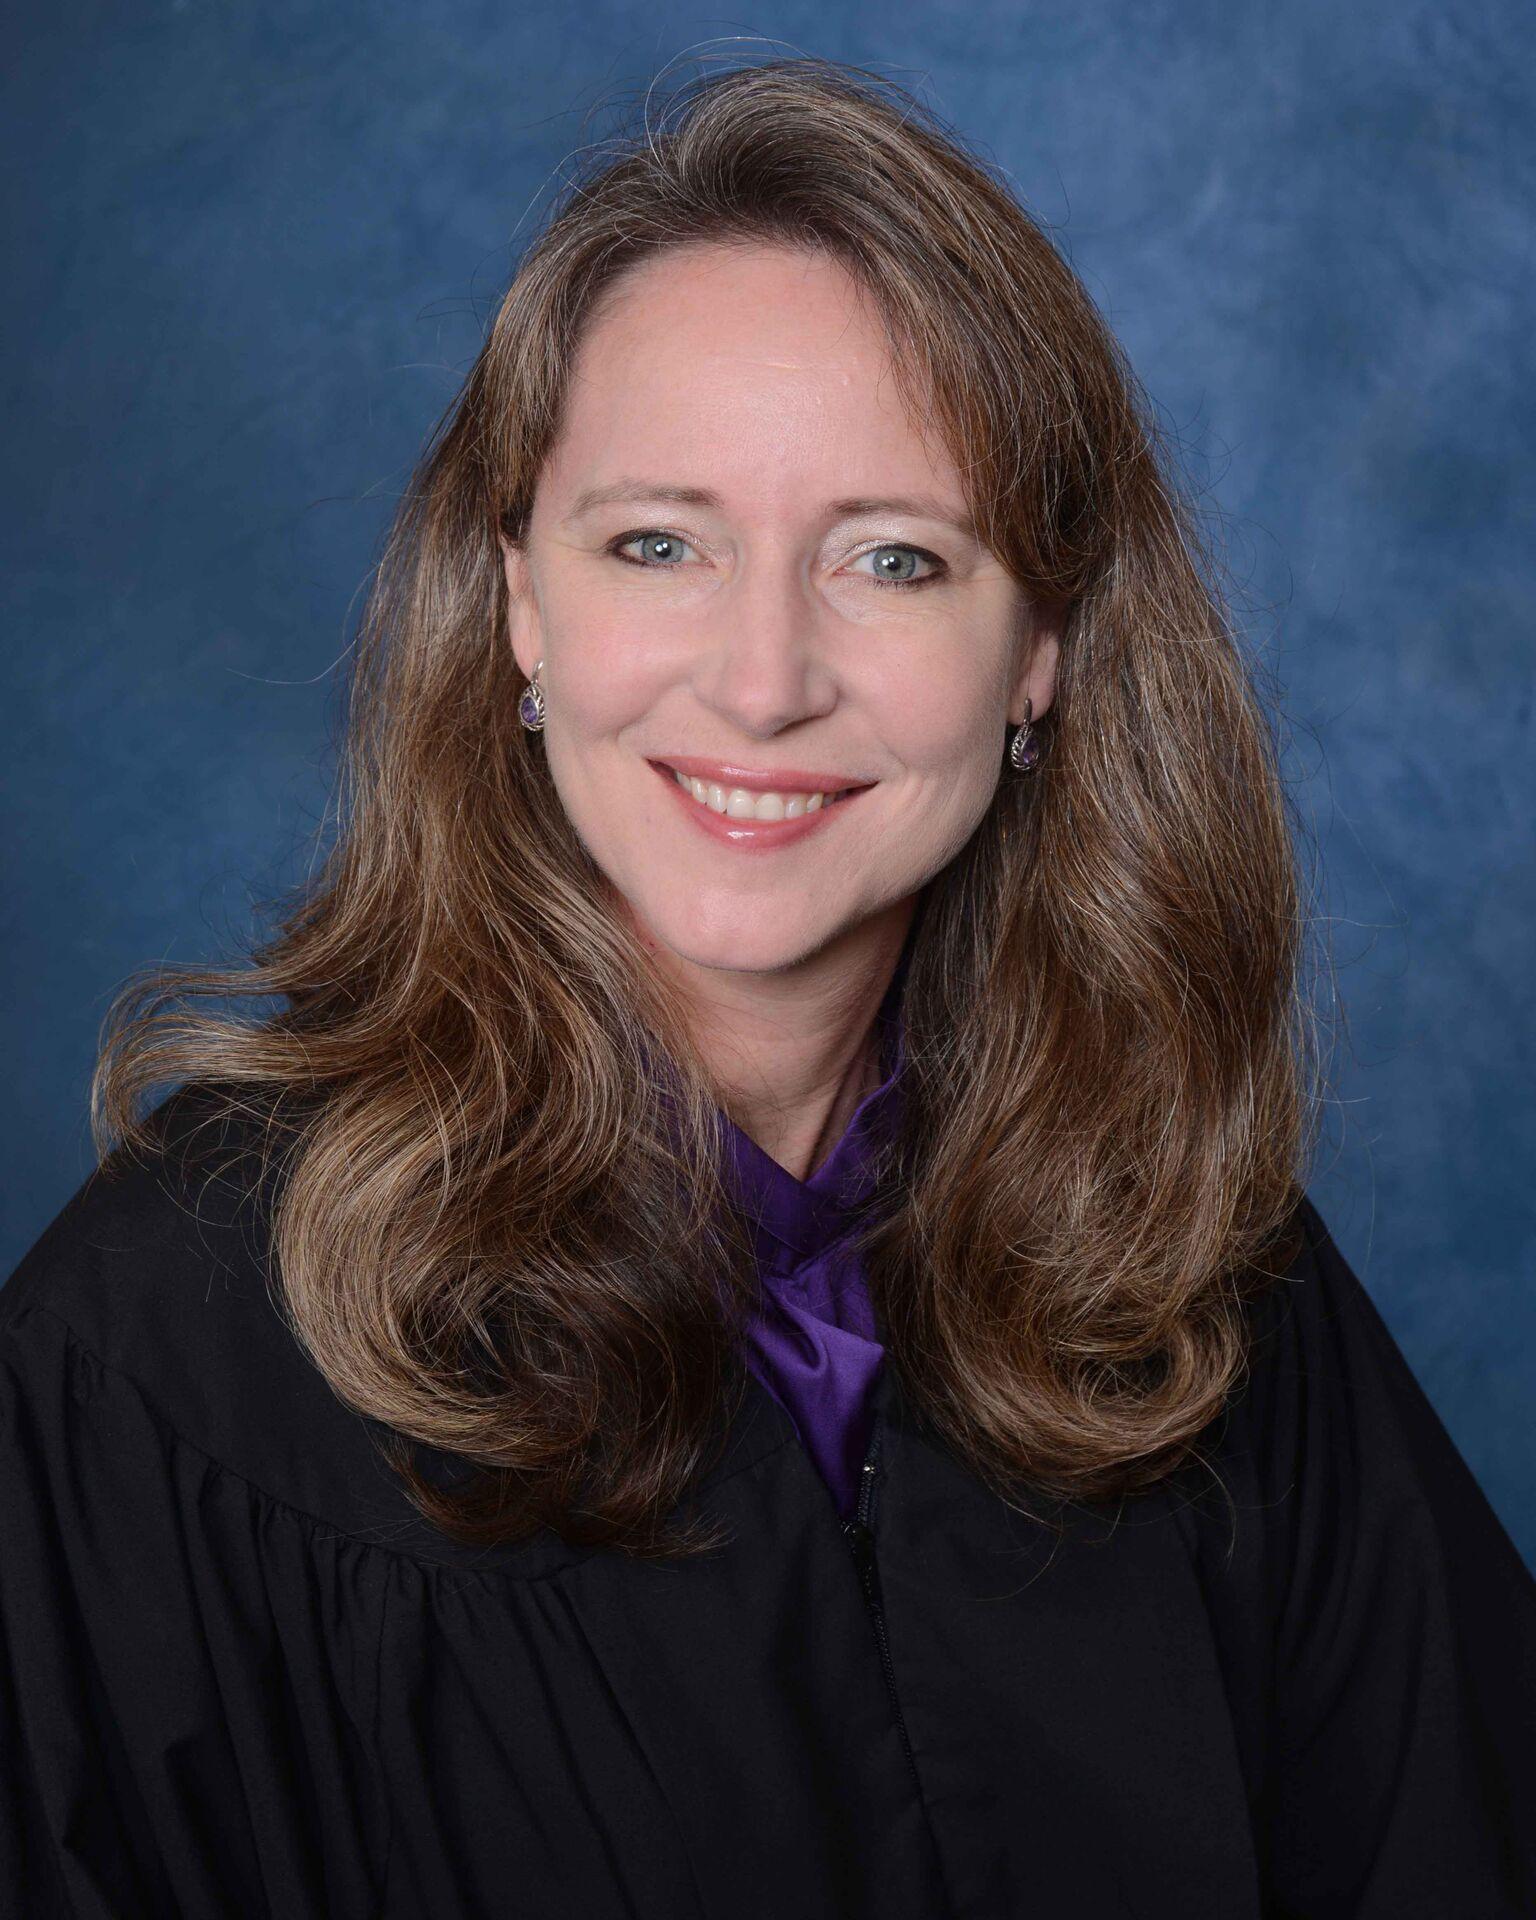 Brevard County Judge Michelle L. Naberhaus